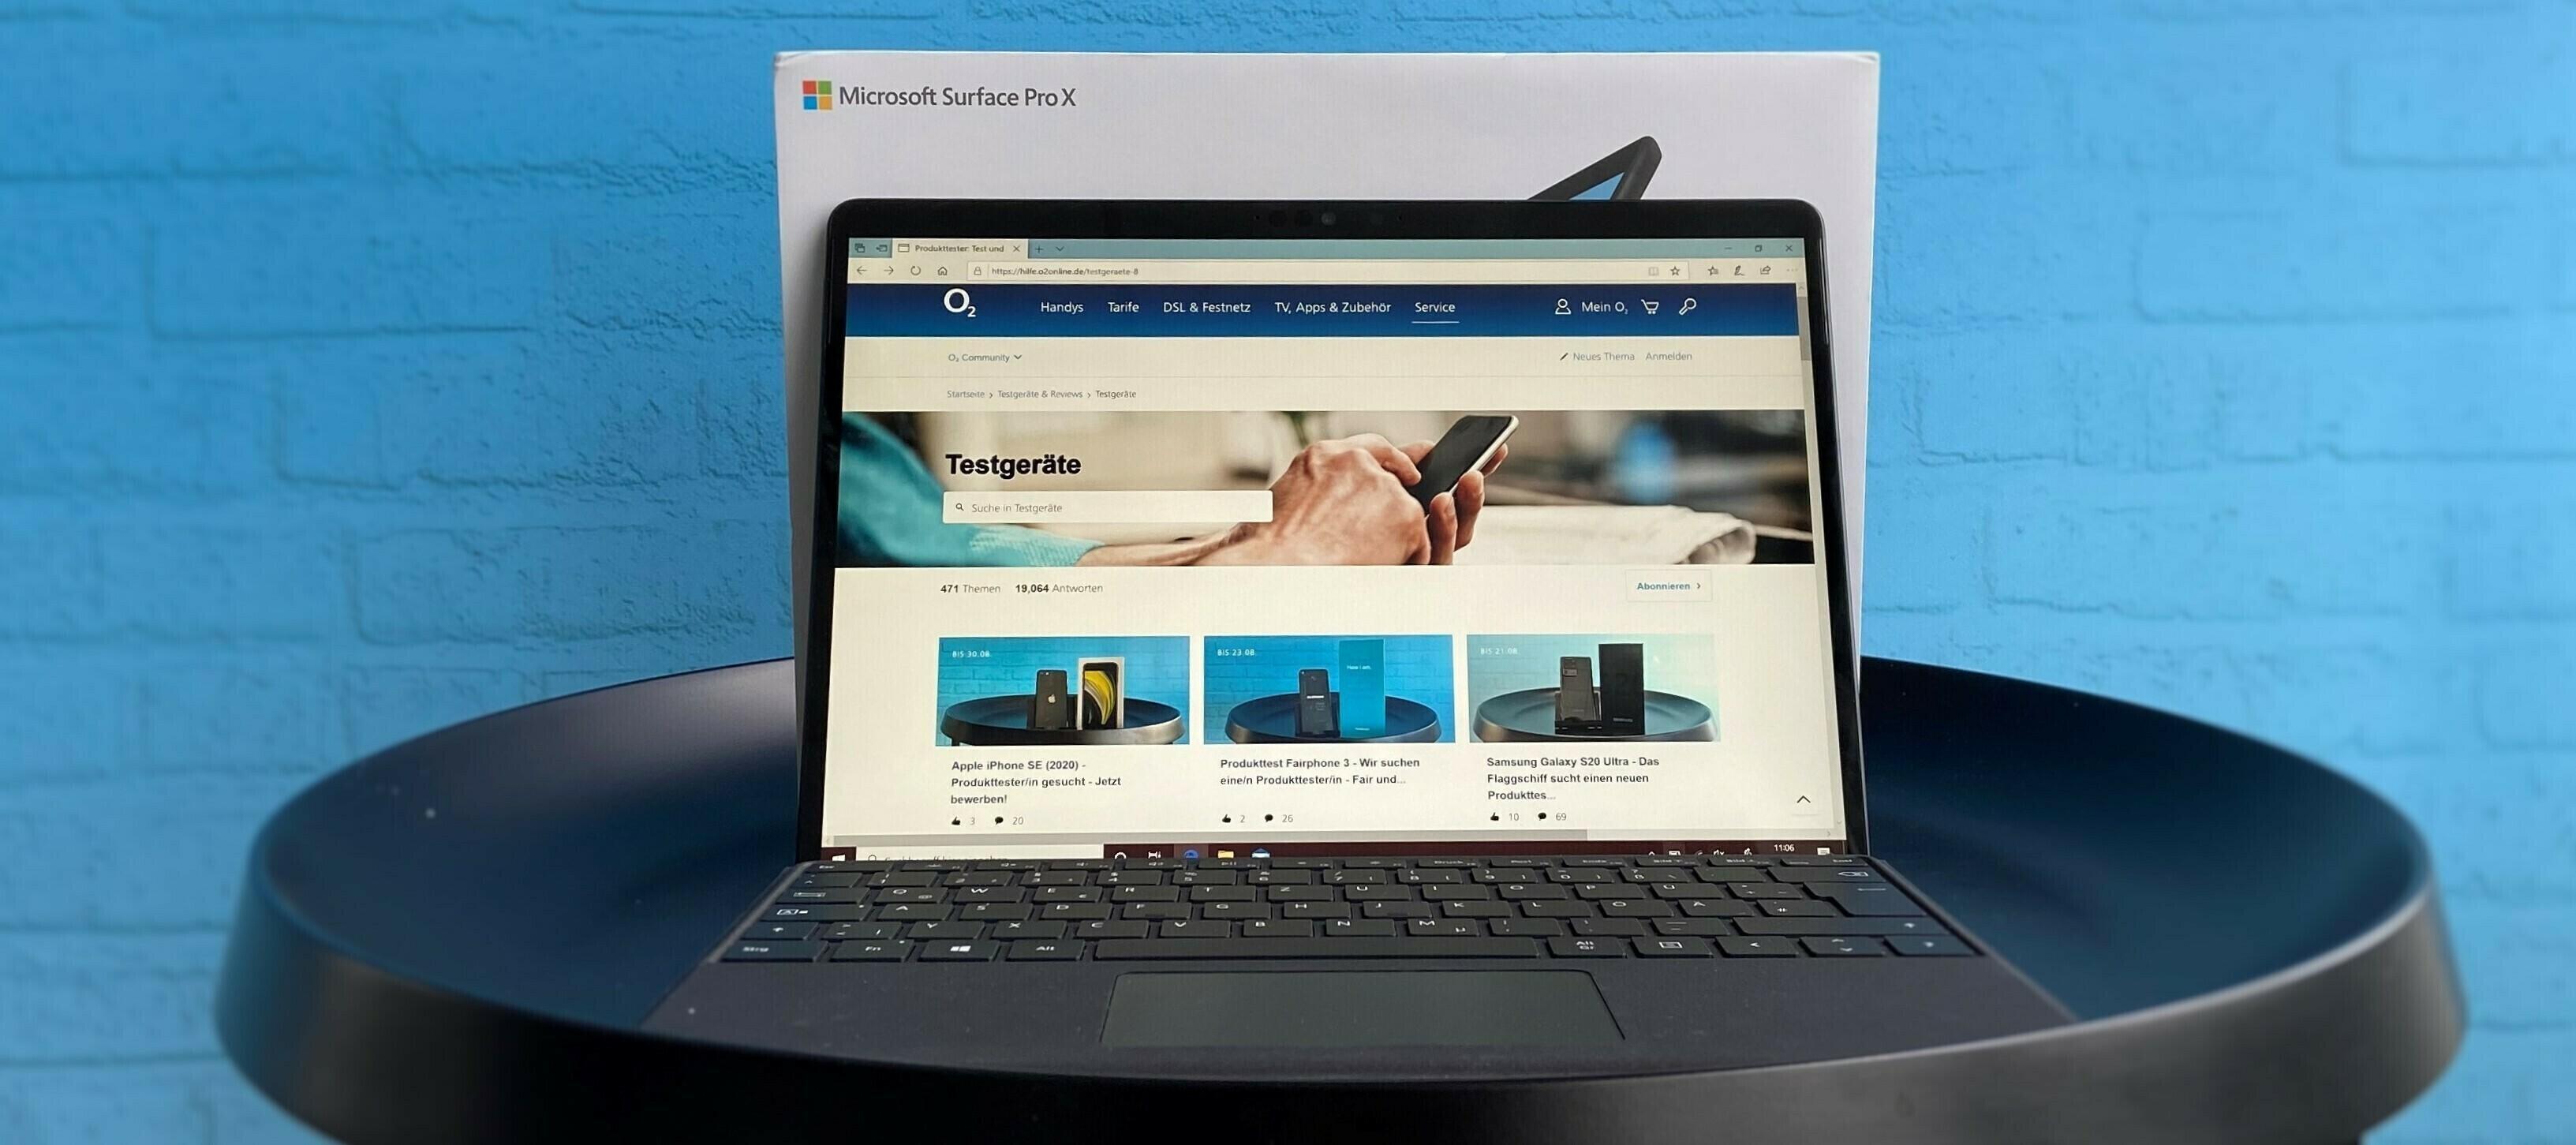 Microsoft Surface Pro X inkl. Signature Keyboard und Slim Pen - werde jetzt Community-Tester:in!